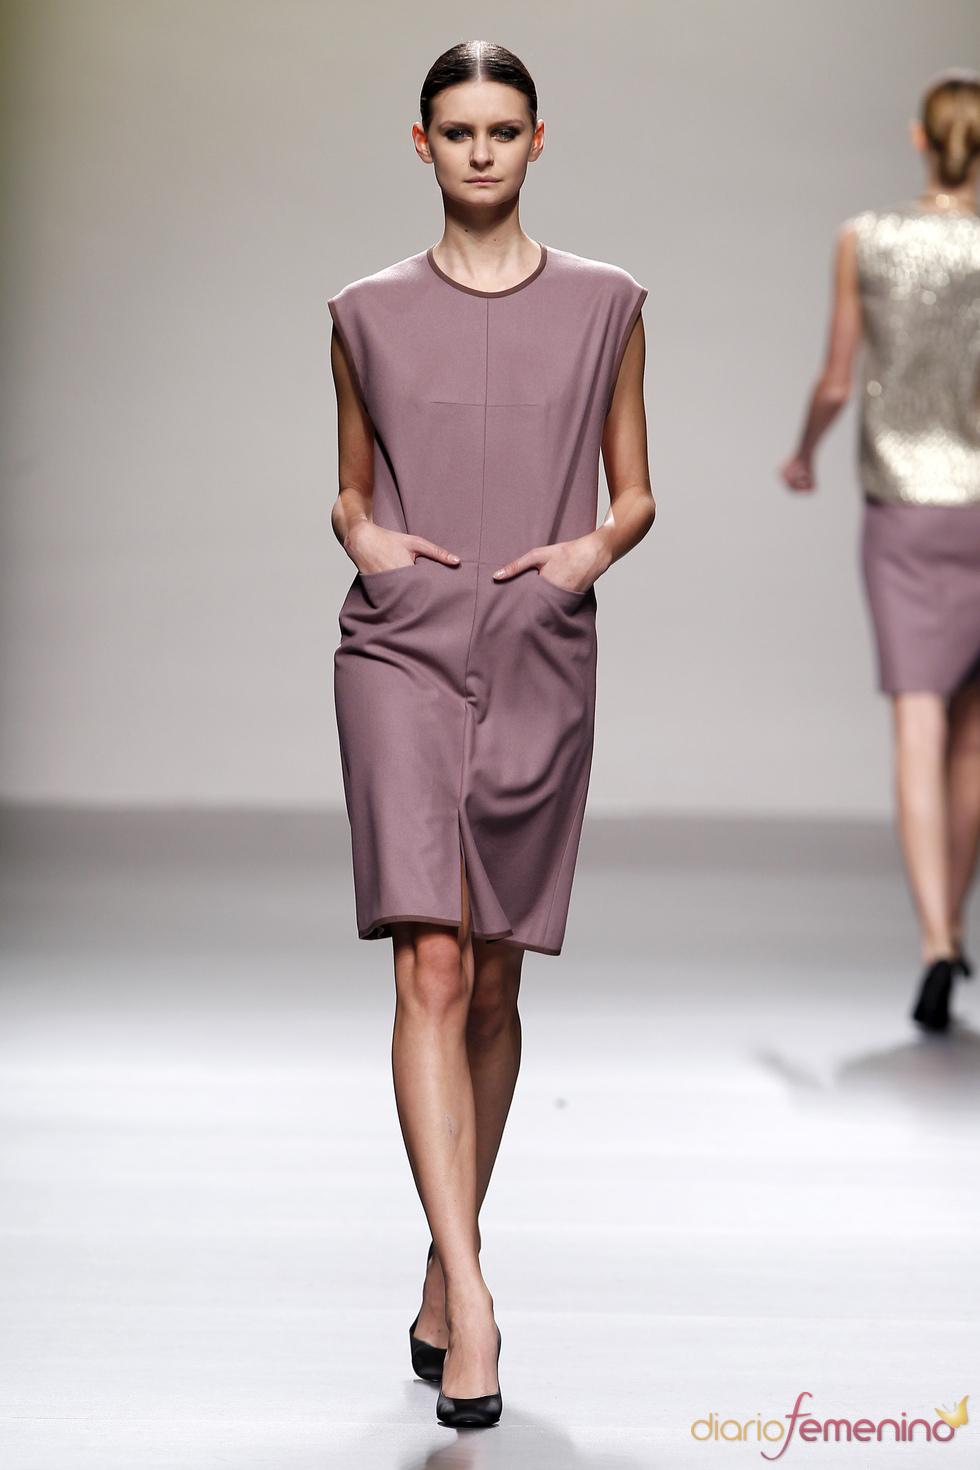 Fotos Moda: Lemoniez en Cibeles Madrid Fashion Week